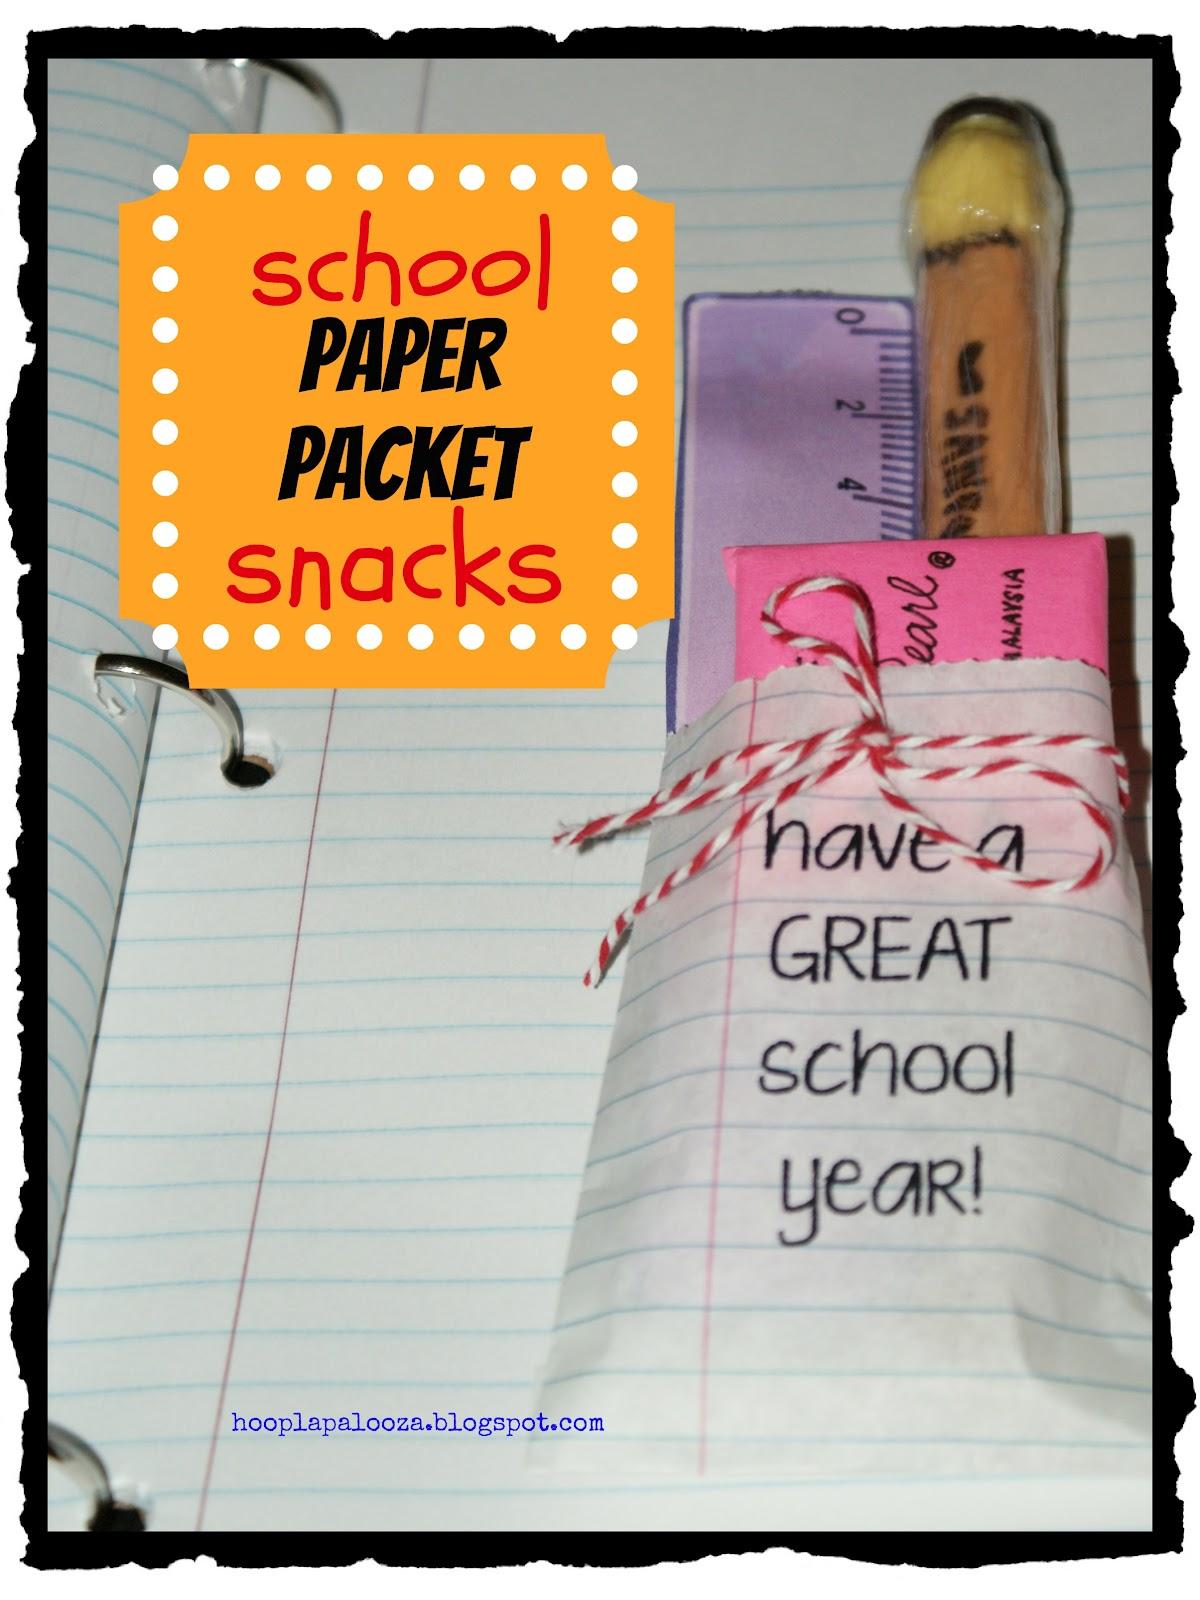 http://1.bp.blogspot.com/-CyHjsQQcN5U/UB7ugv3Ry1I/AAAAAAAABKc/gQ2aoXbUjwc/s1600/school-paper-packet-snack-title-hooplapalooza.jpg